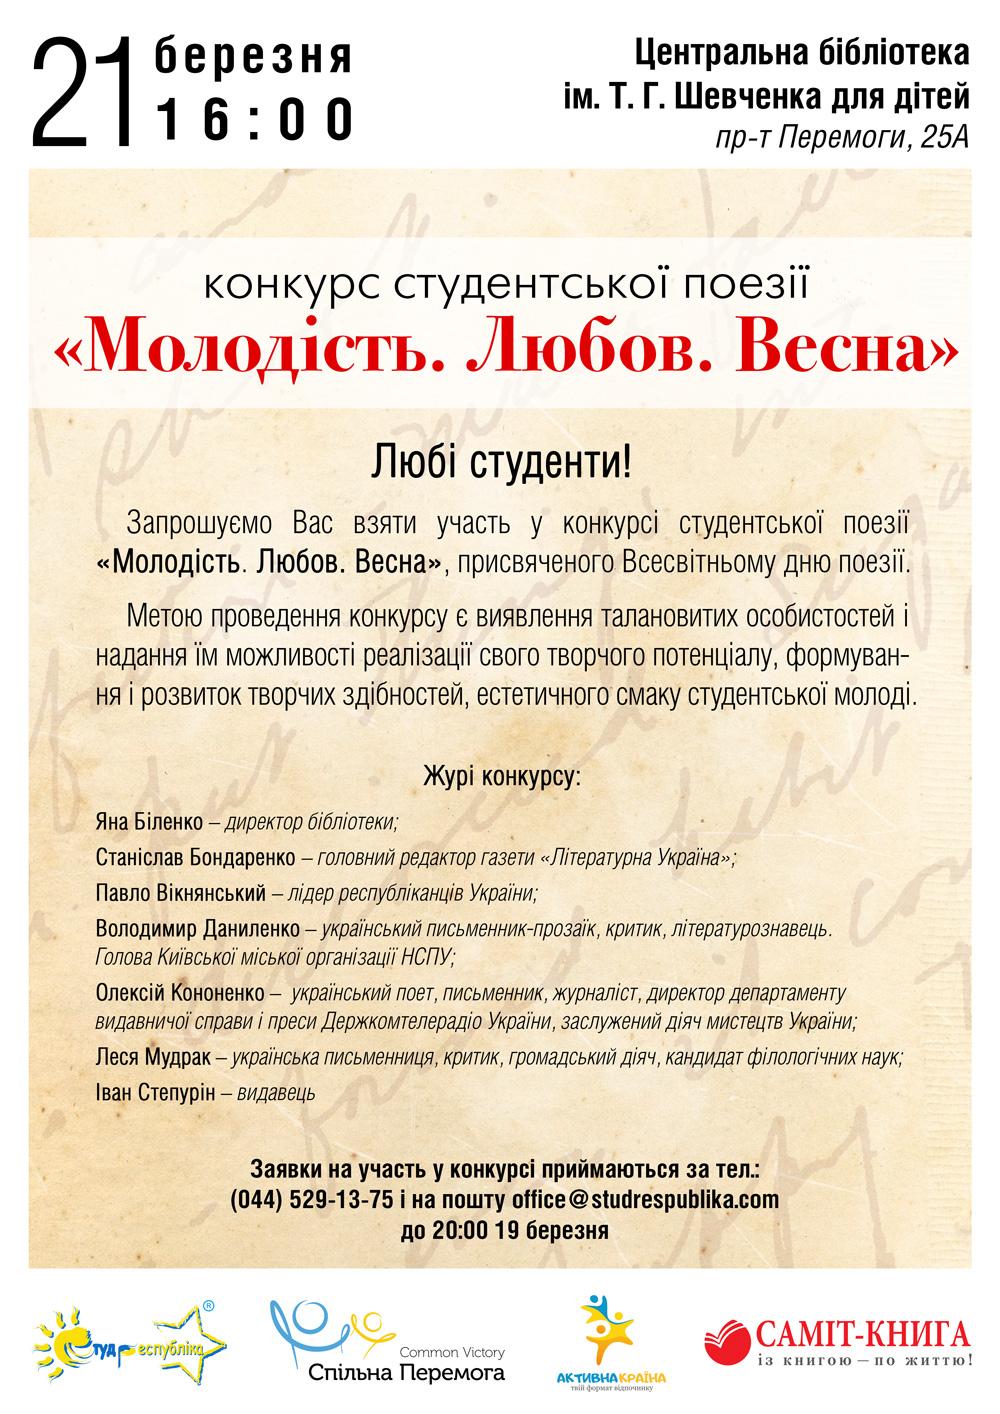 Stud-Konkurs+Bondarenko_afisha_A1